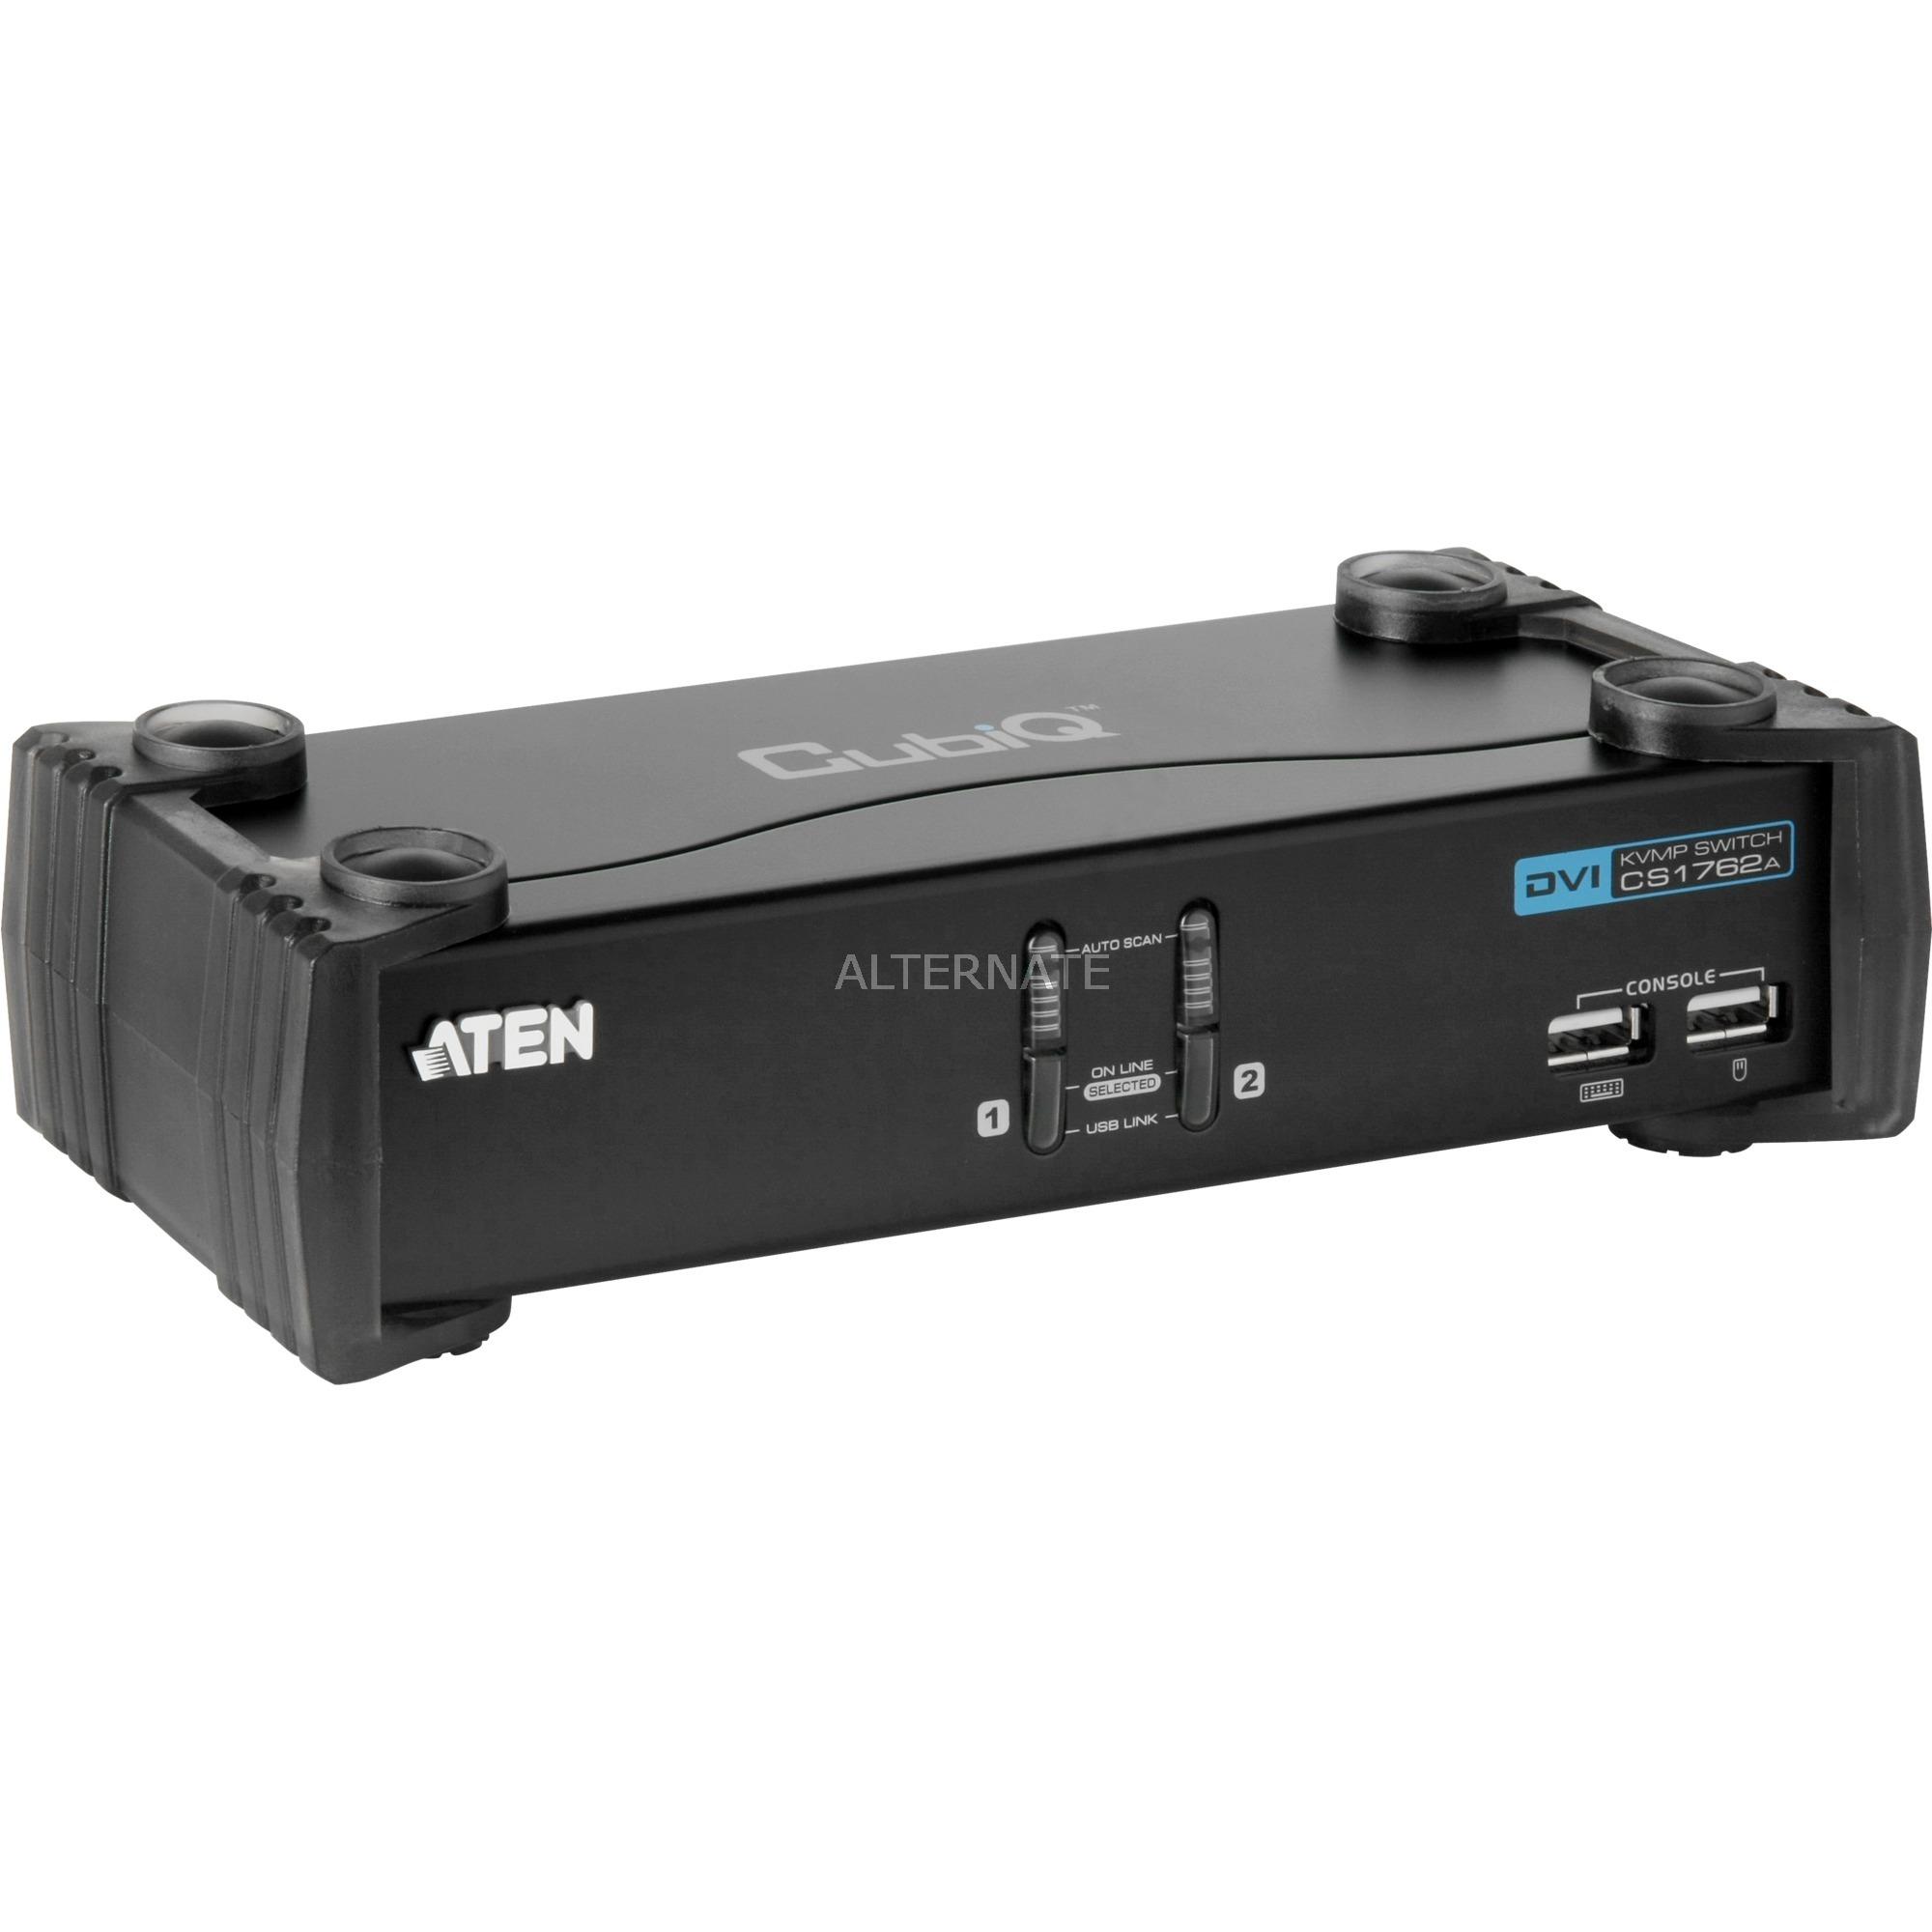 CS1762A Negro interruptor KVM, Switch KVM